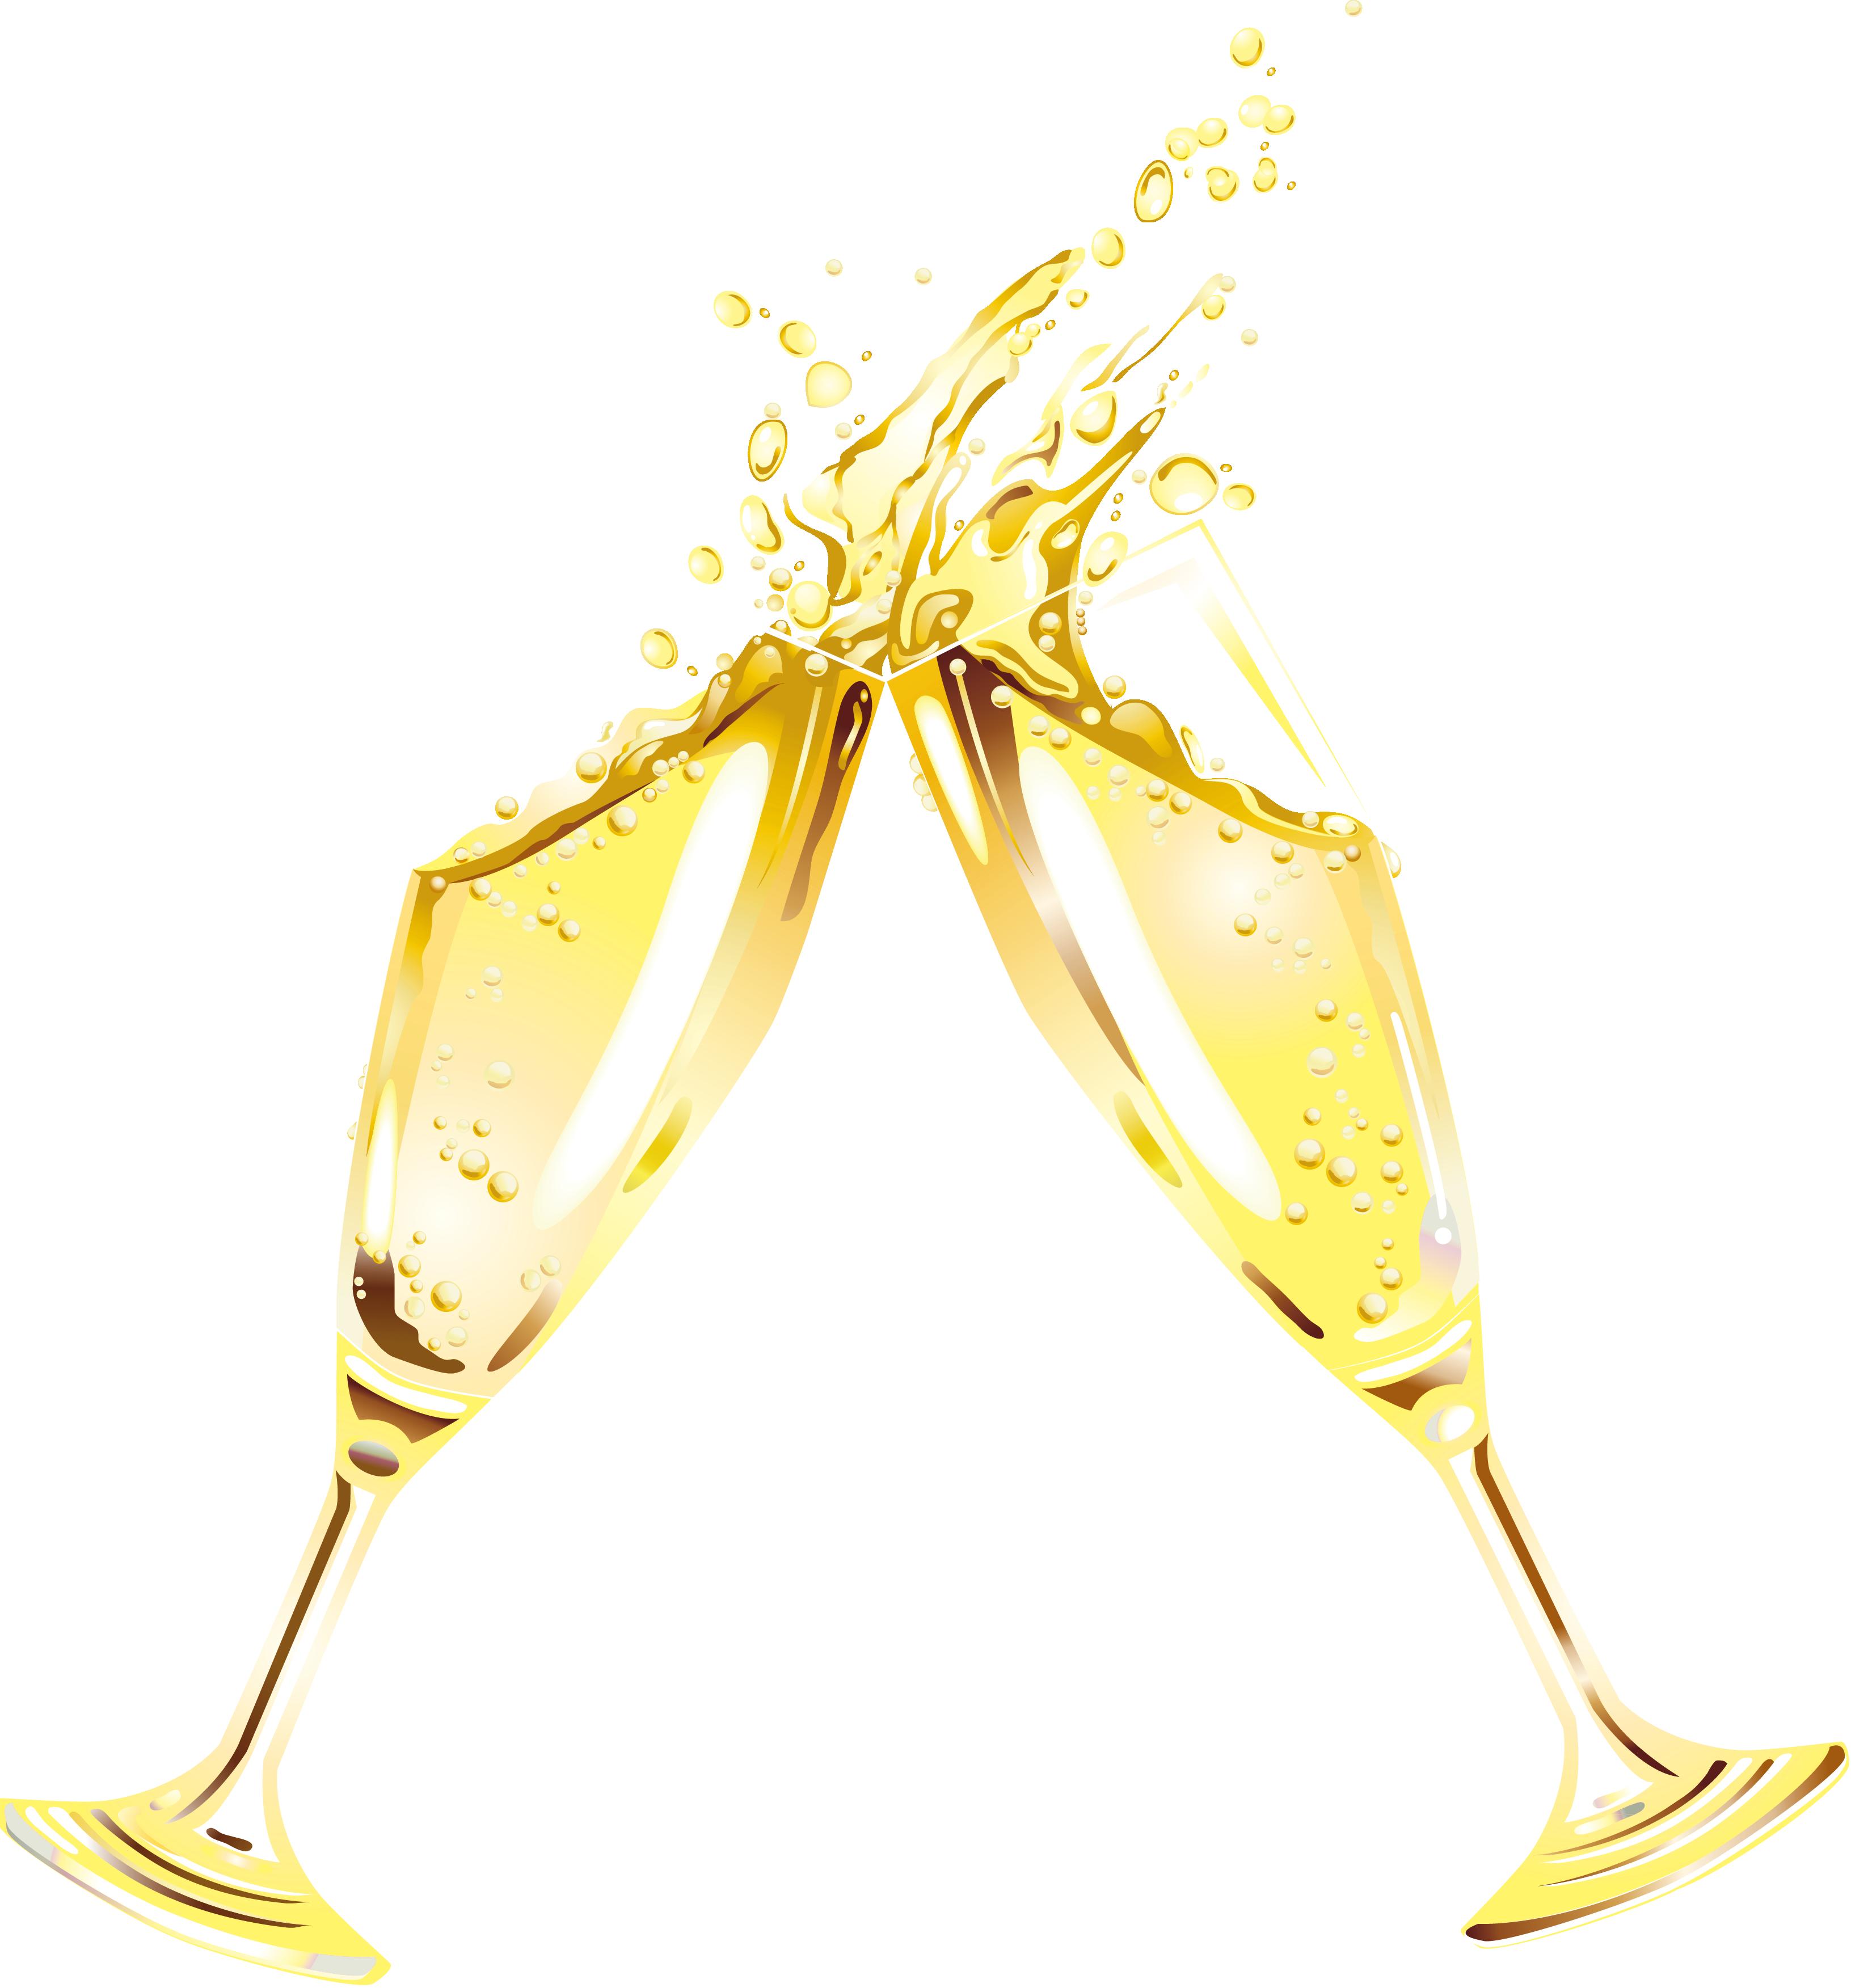 Champagne glass cilpart marvelous. Flutes clipart flute player